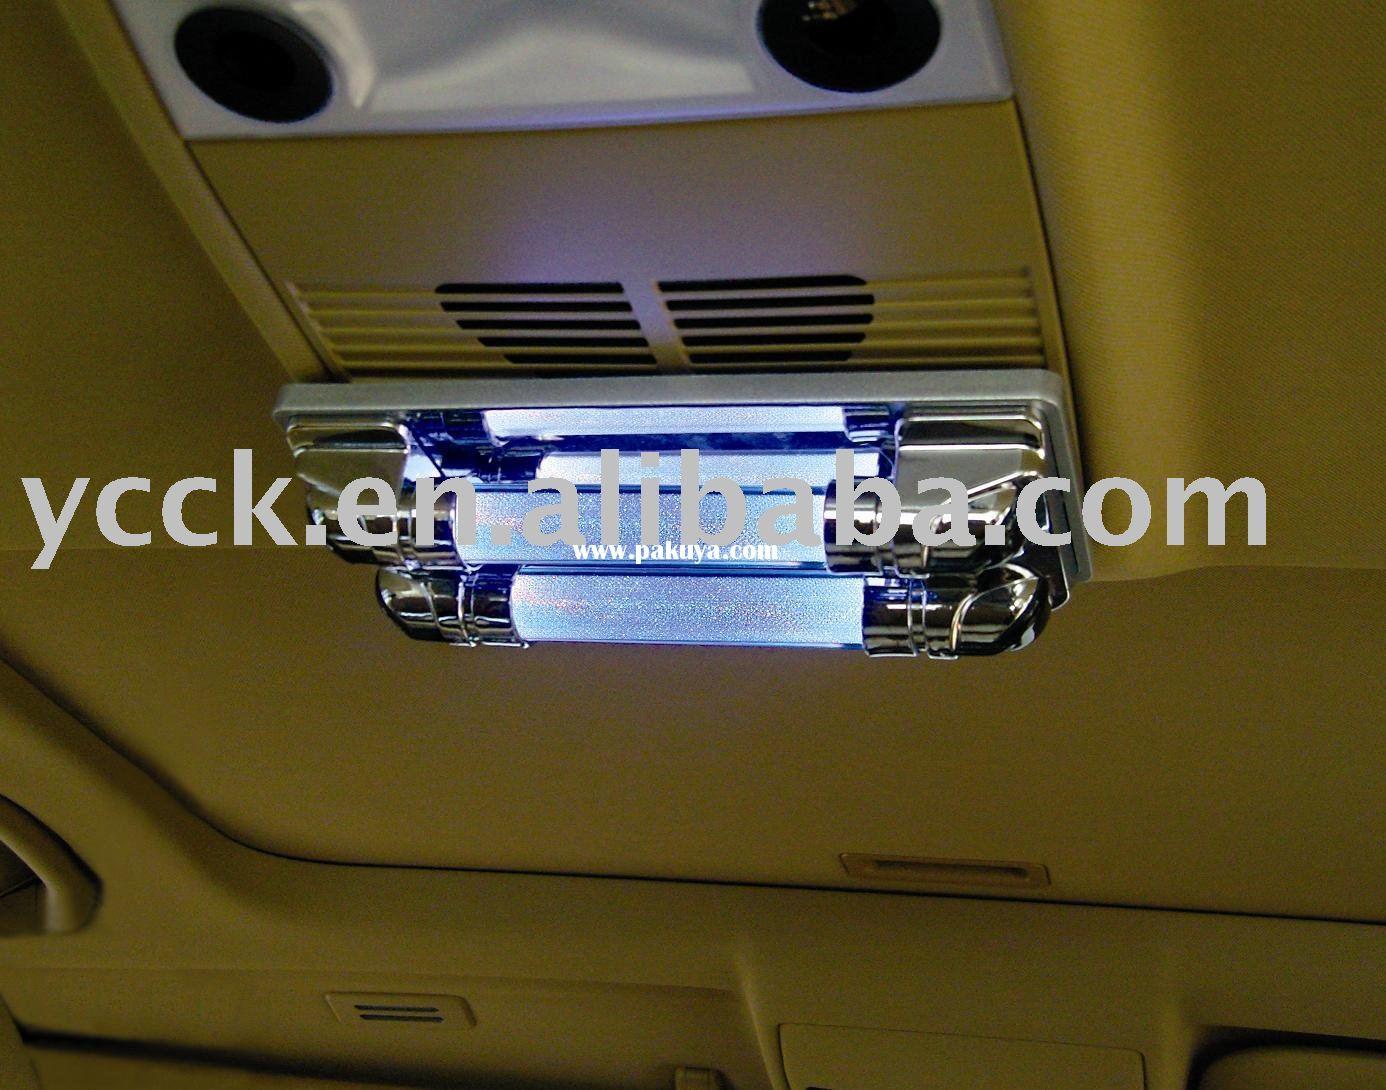 Car Ceiling Light: car ceiling light photo - 1,Lighting